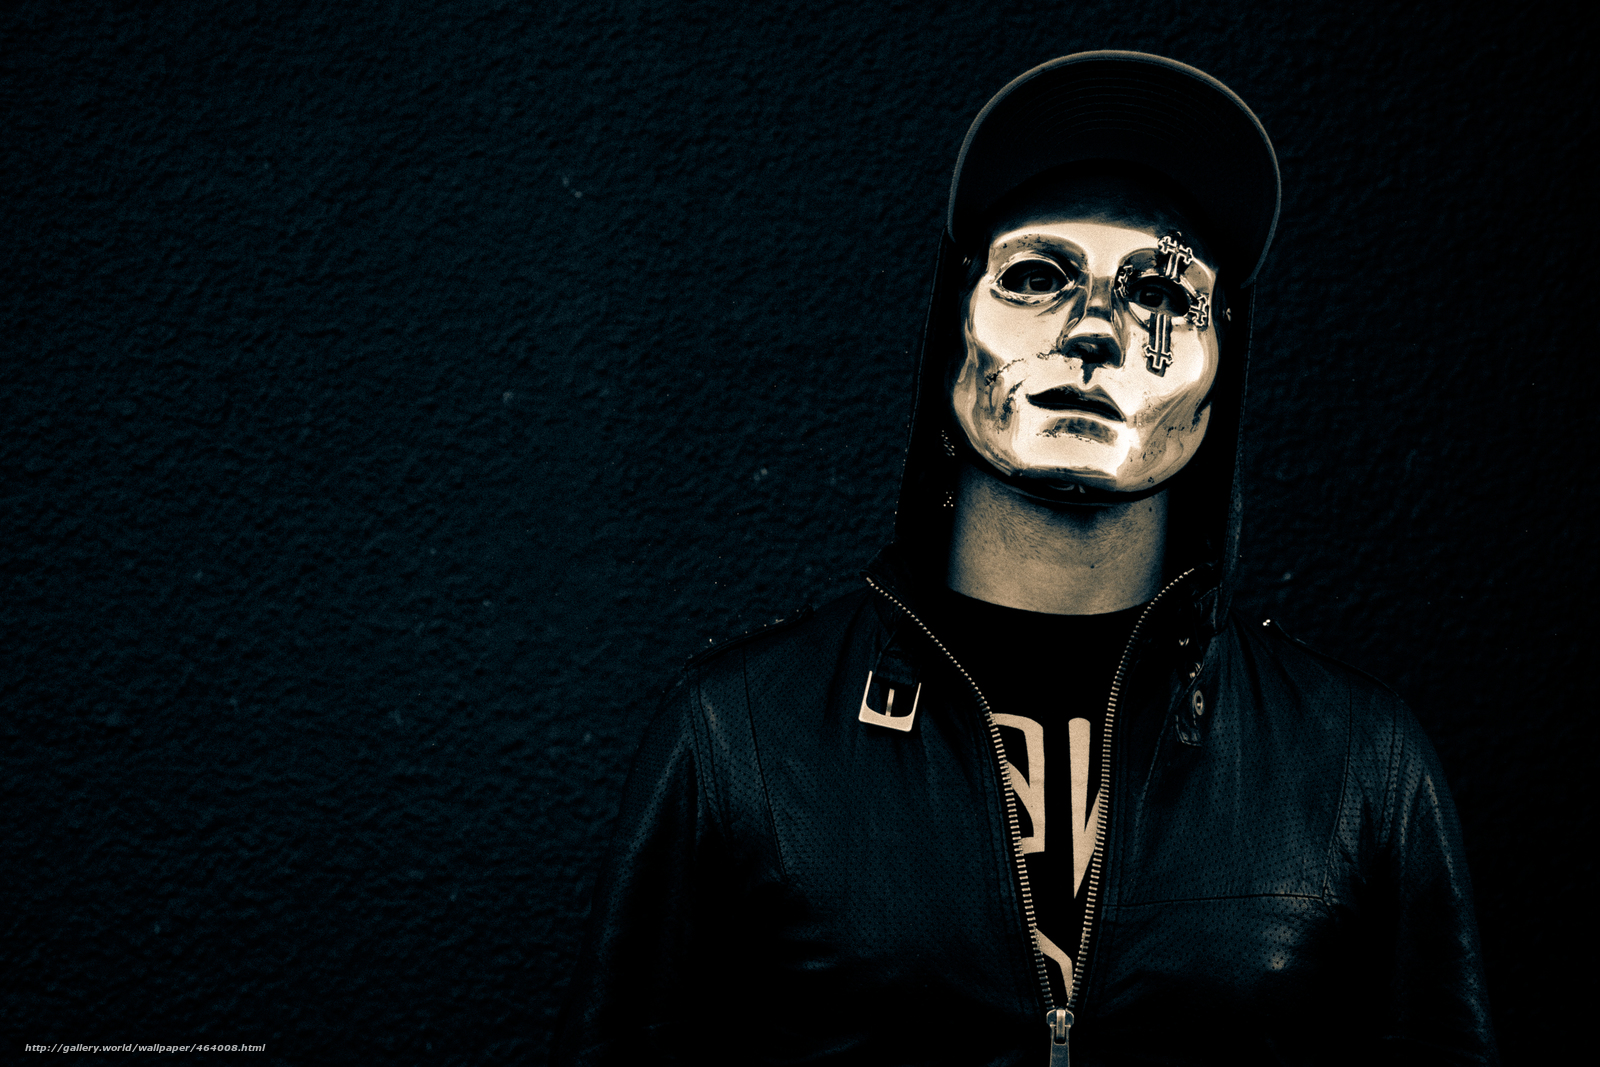 wallpaper hollywood undead danny american tragedy mask desktop 1600x1067